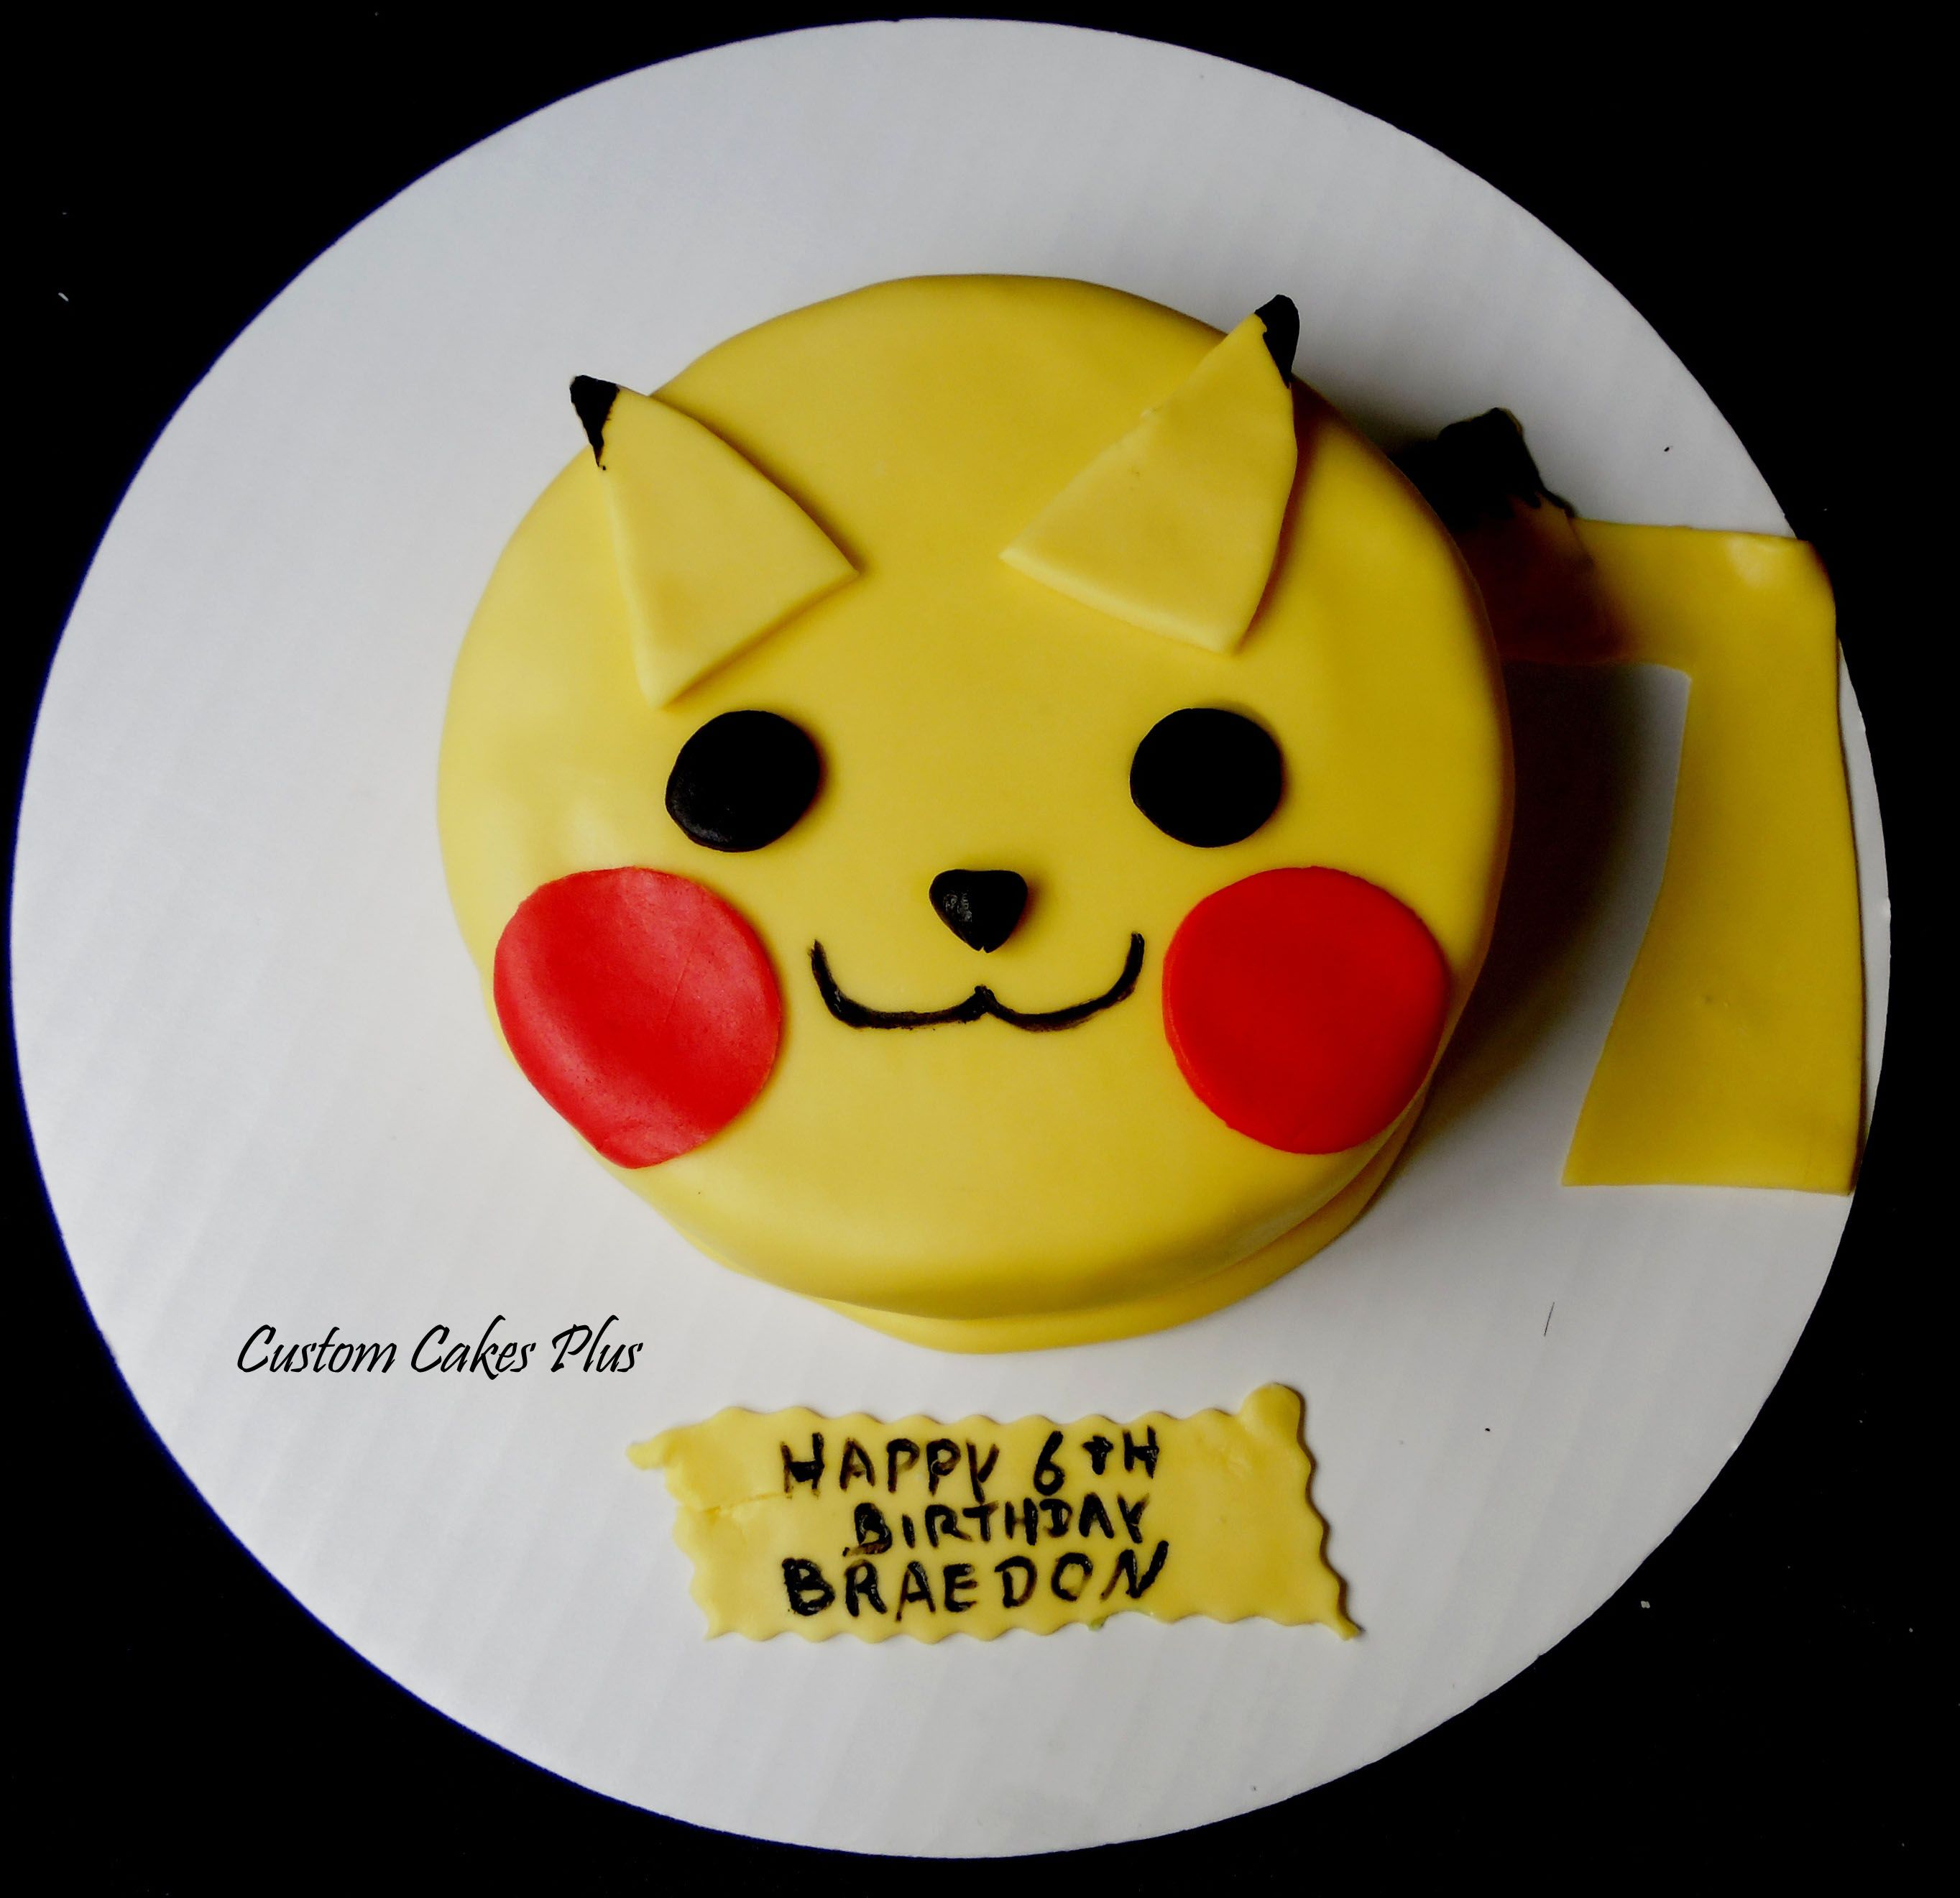 Pikachu Birthday Cake Pikachu Birthda...